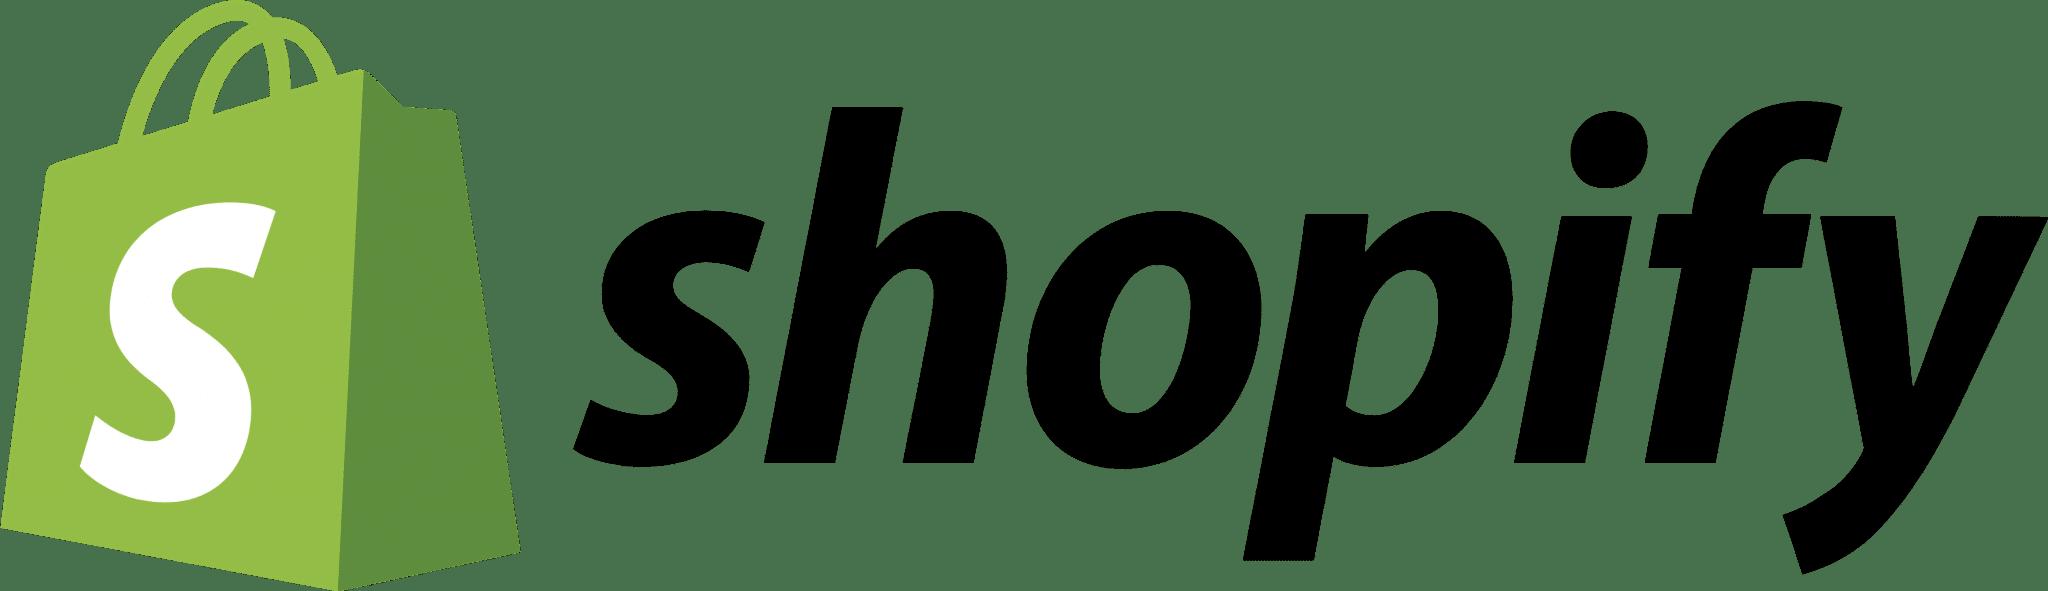 shopify developer kolkata - Atanu Das - Remote IT Consultant